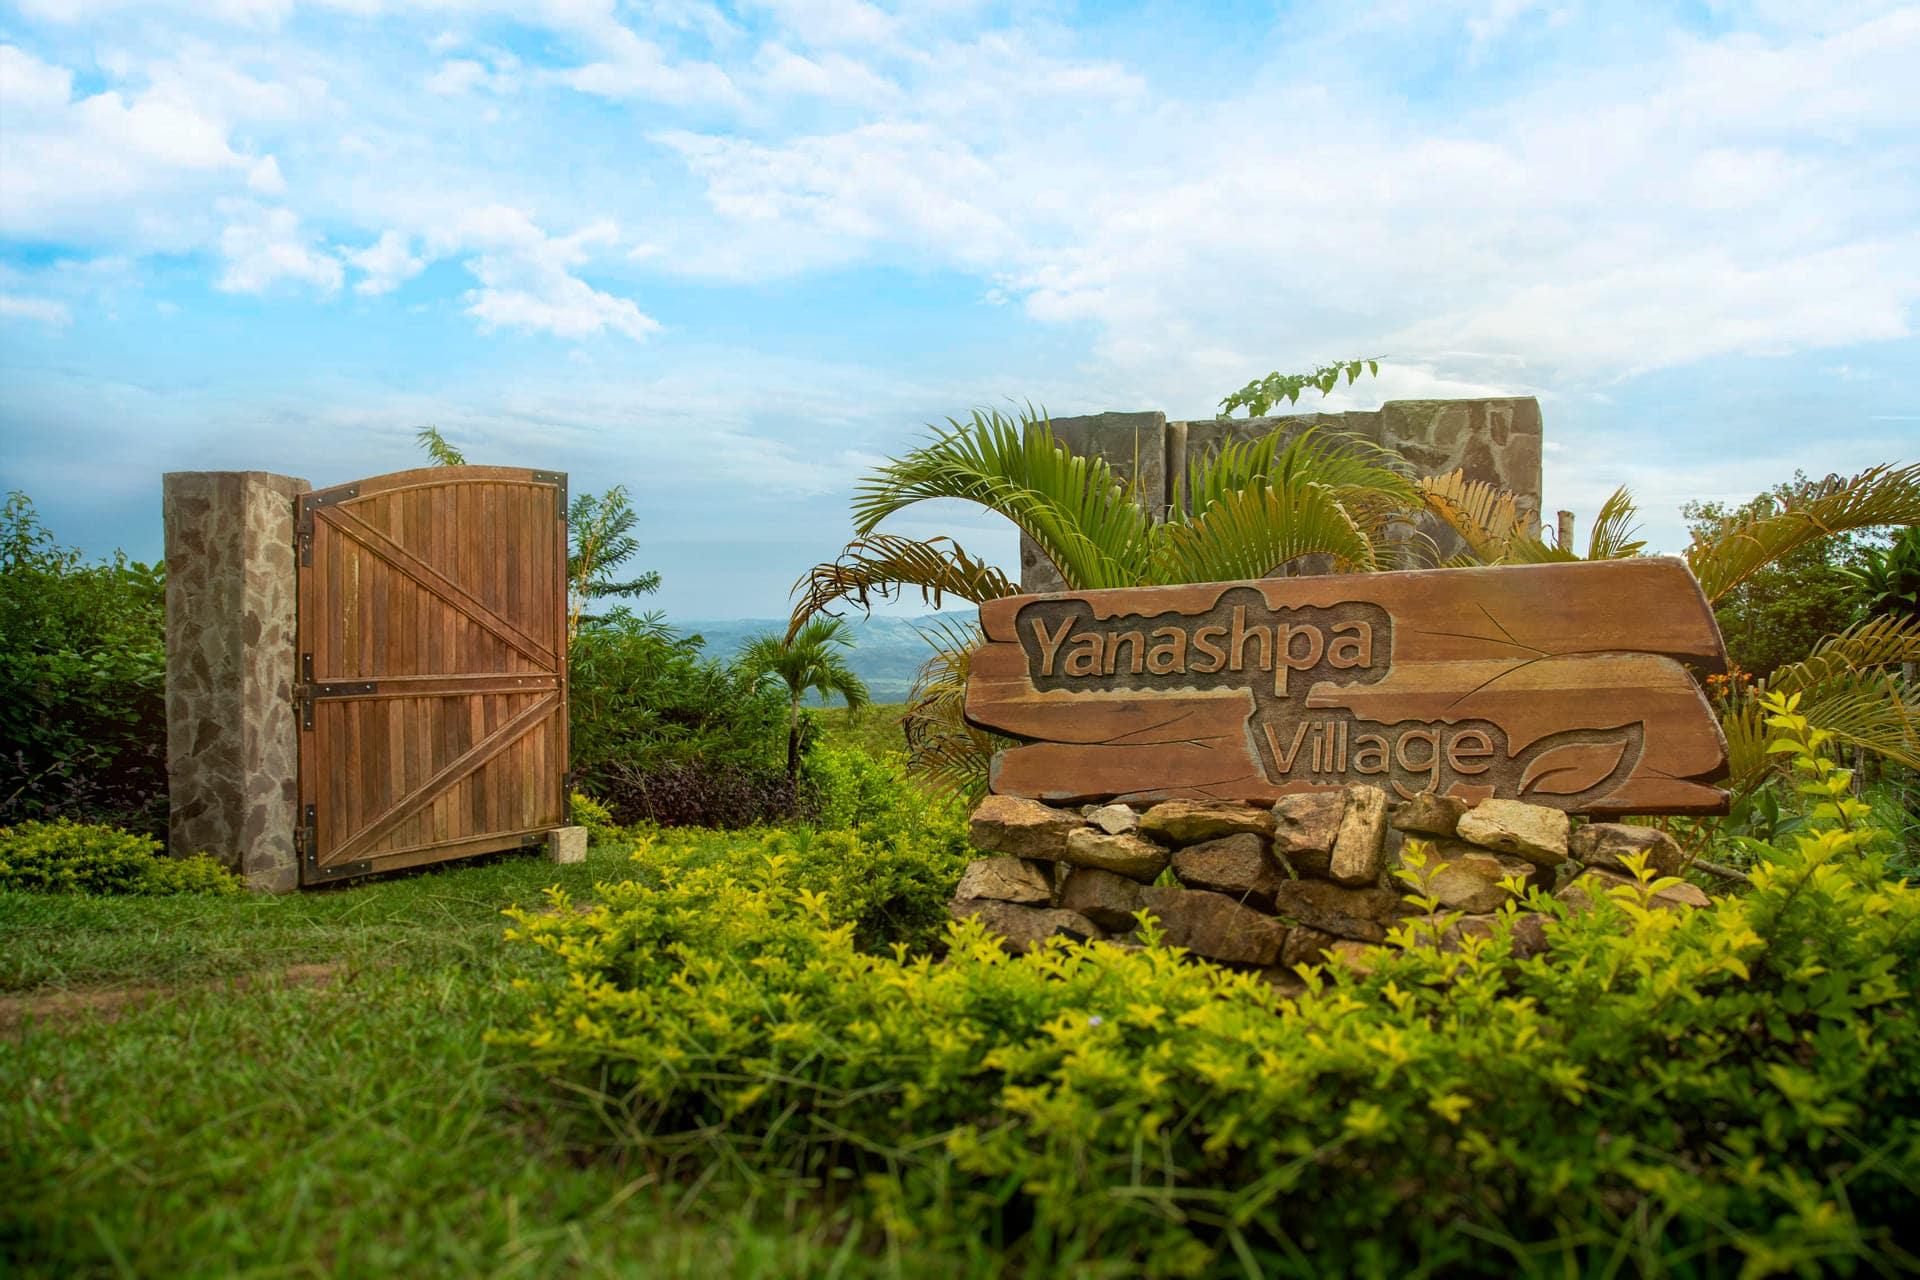 Pórtico de ingreso con cerco vivo en Yanashpa Village, Tarapoto